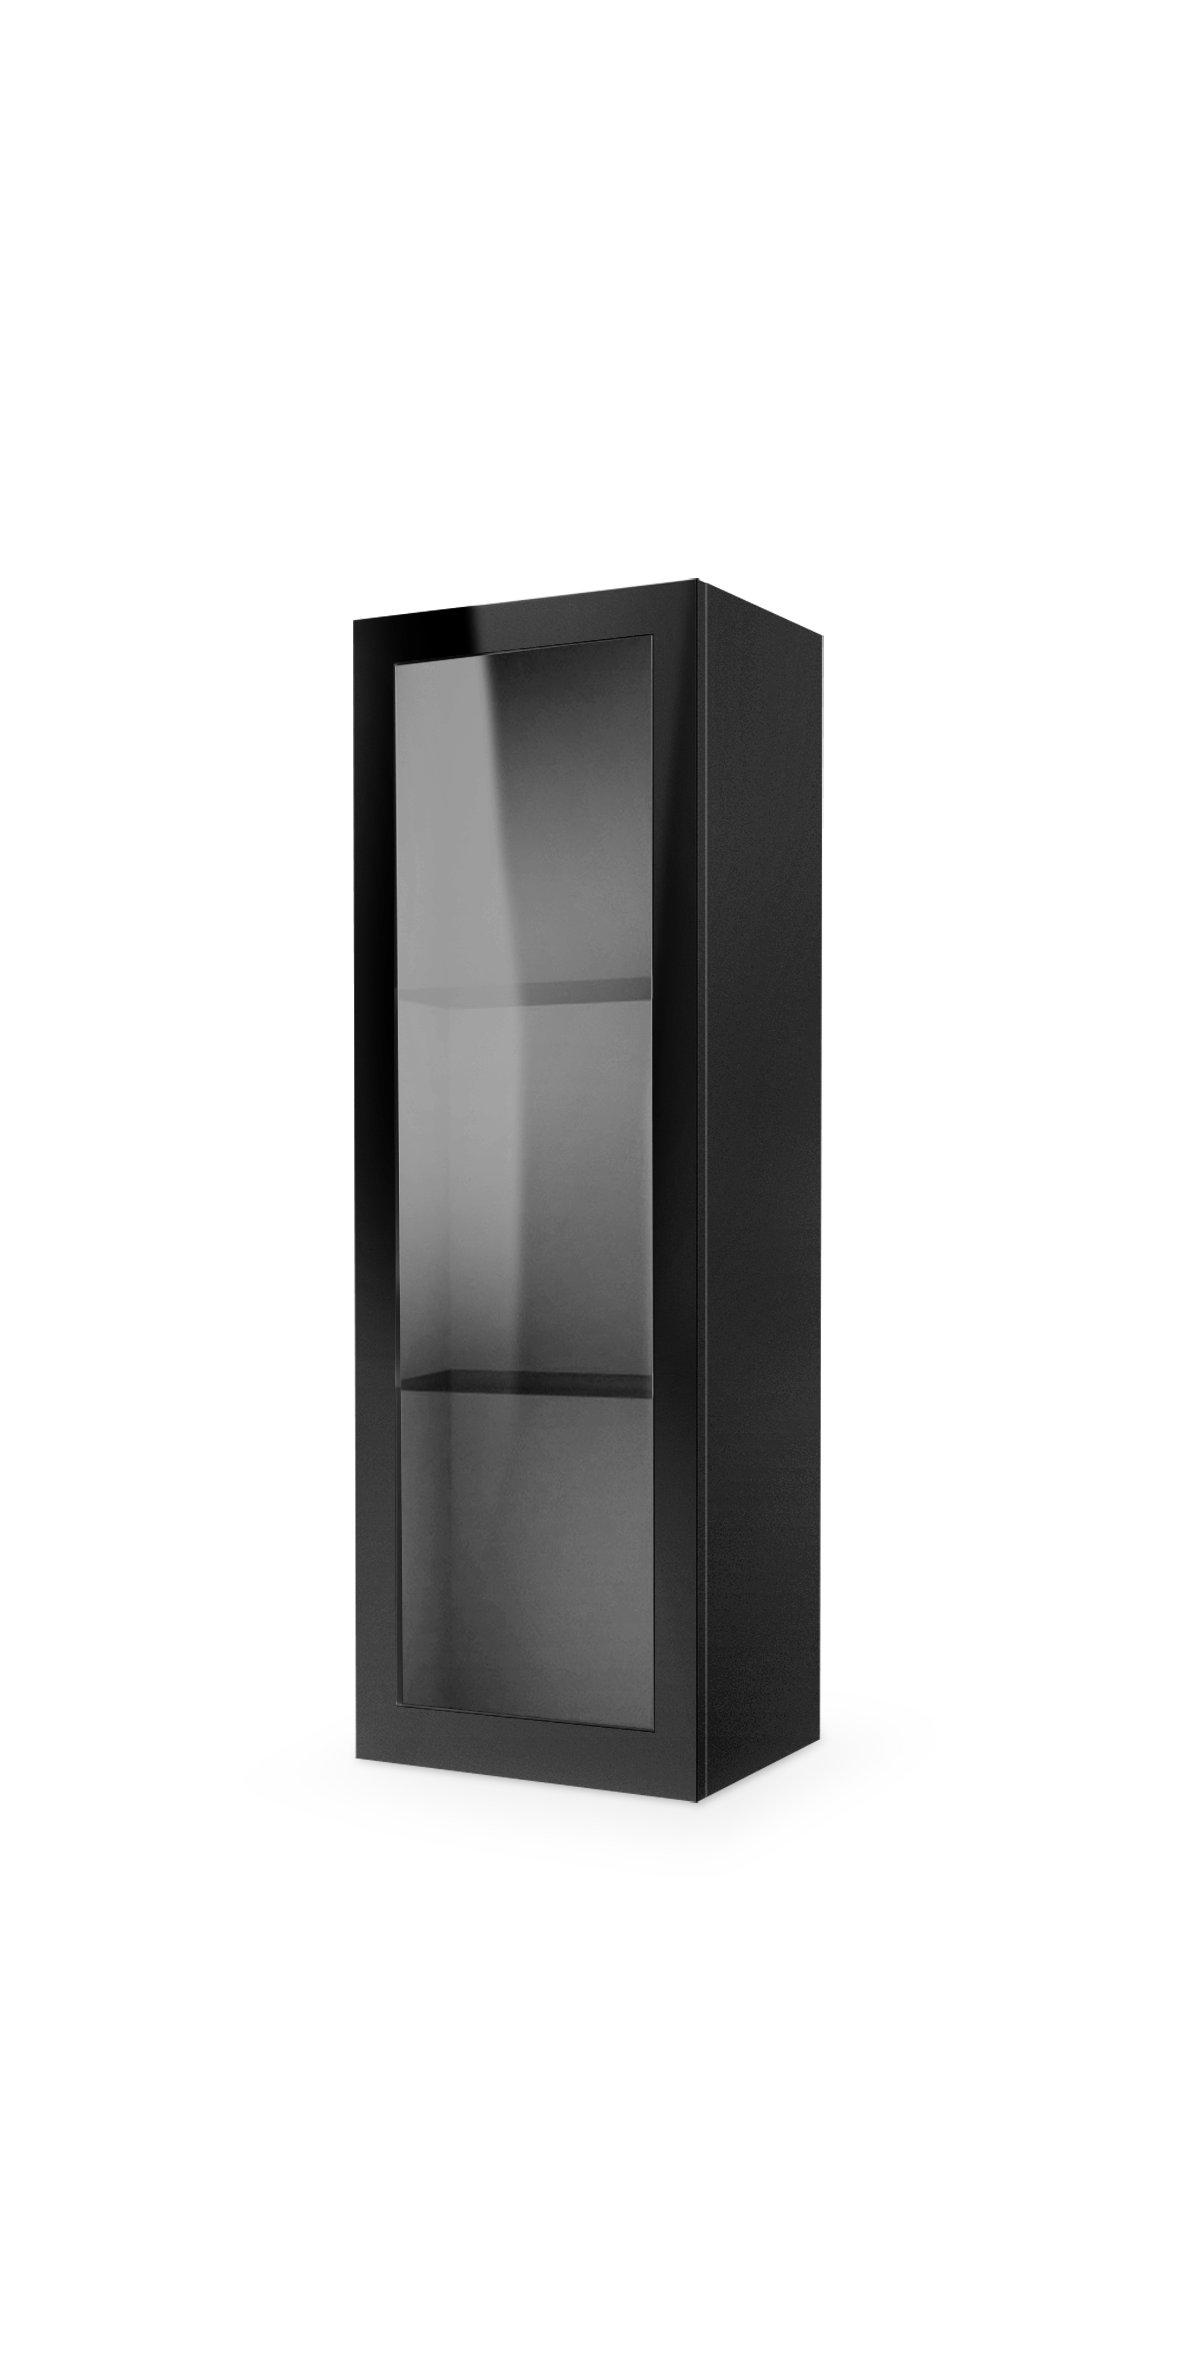 Dulap din MDF Livo W-120 Black l40xA30xH120 cm